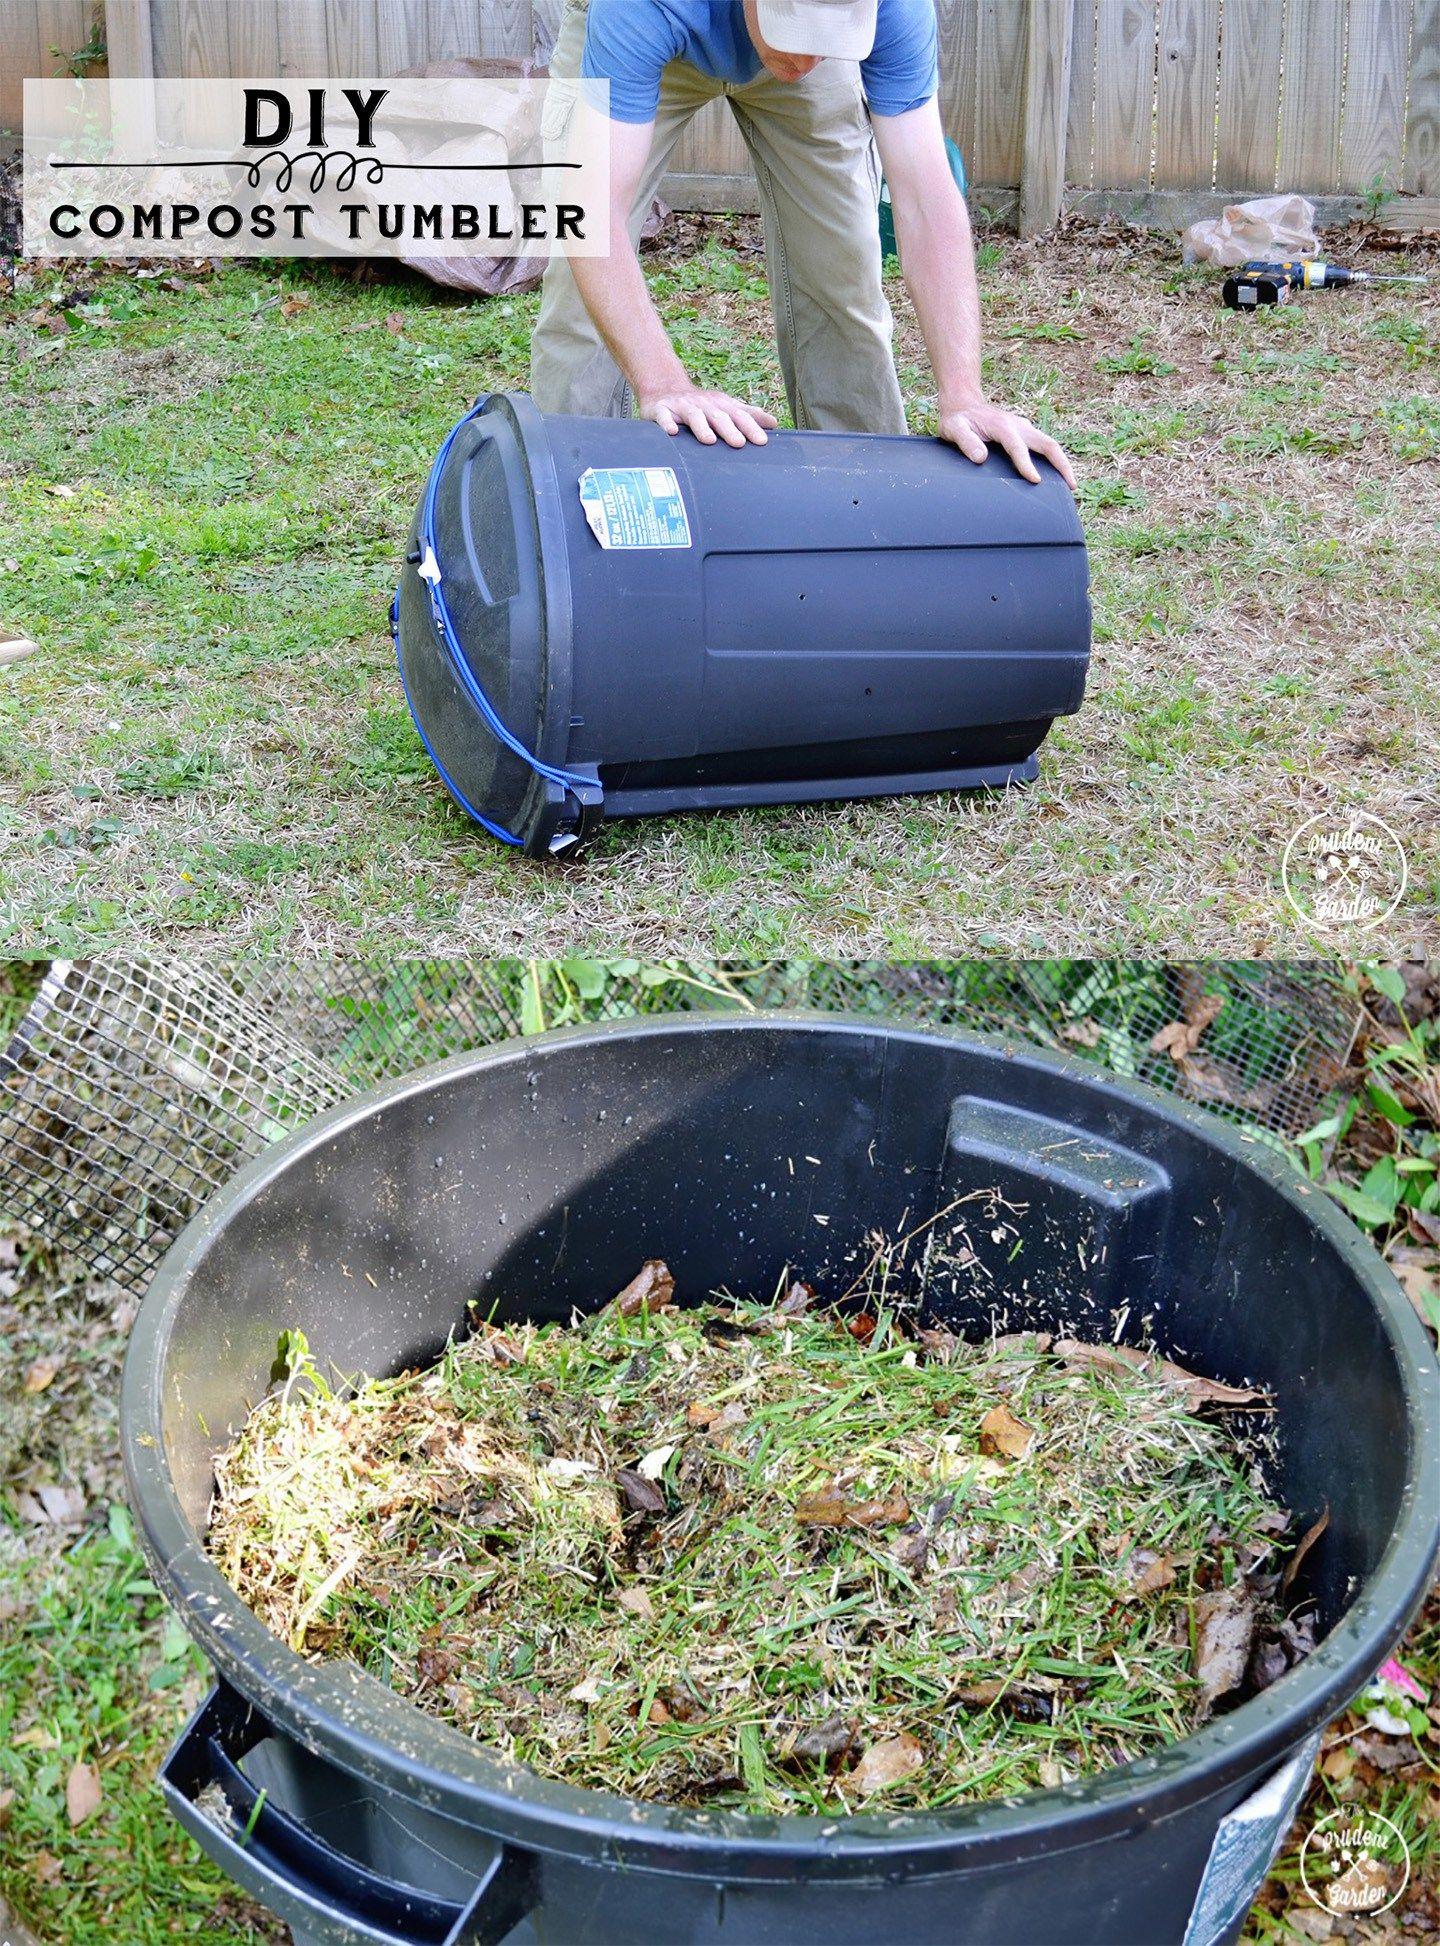 cheap diy compost tumbler diy compost tumbler composting and